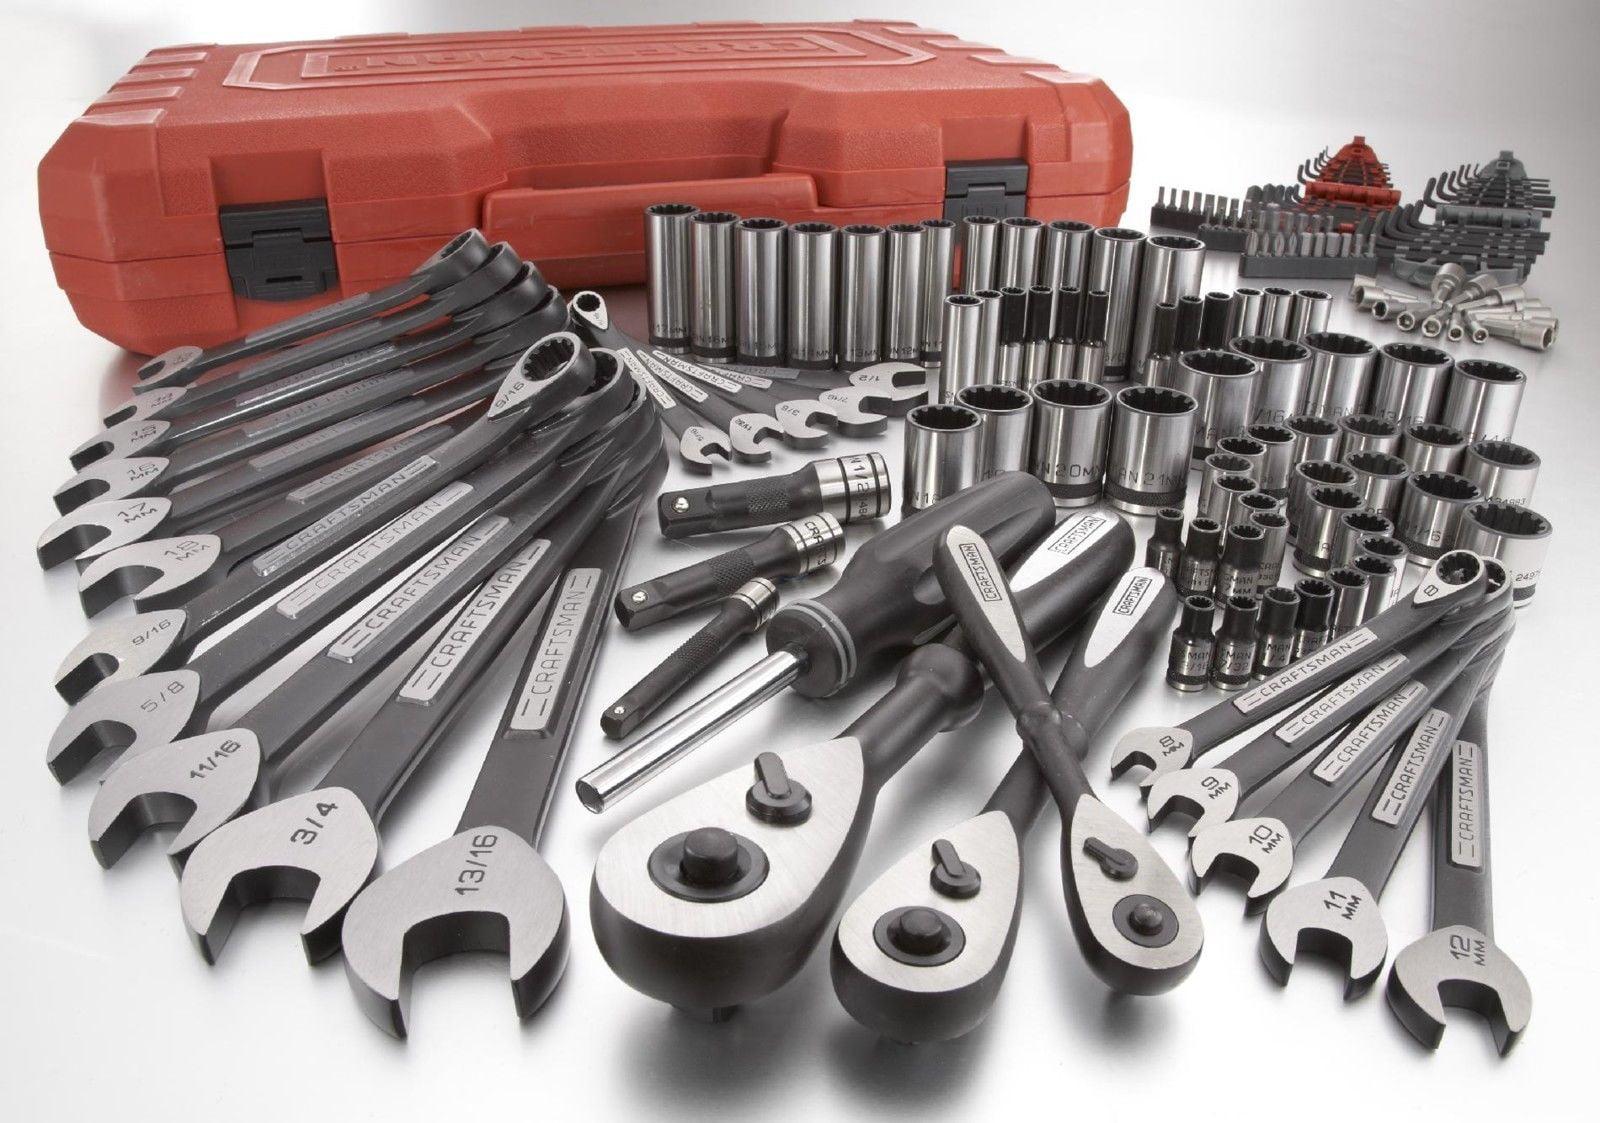 Craftsman Universal Mechanic's Tool Set 153 pc. Wrench Socket 39153 by Craftsman